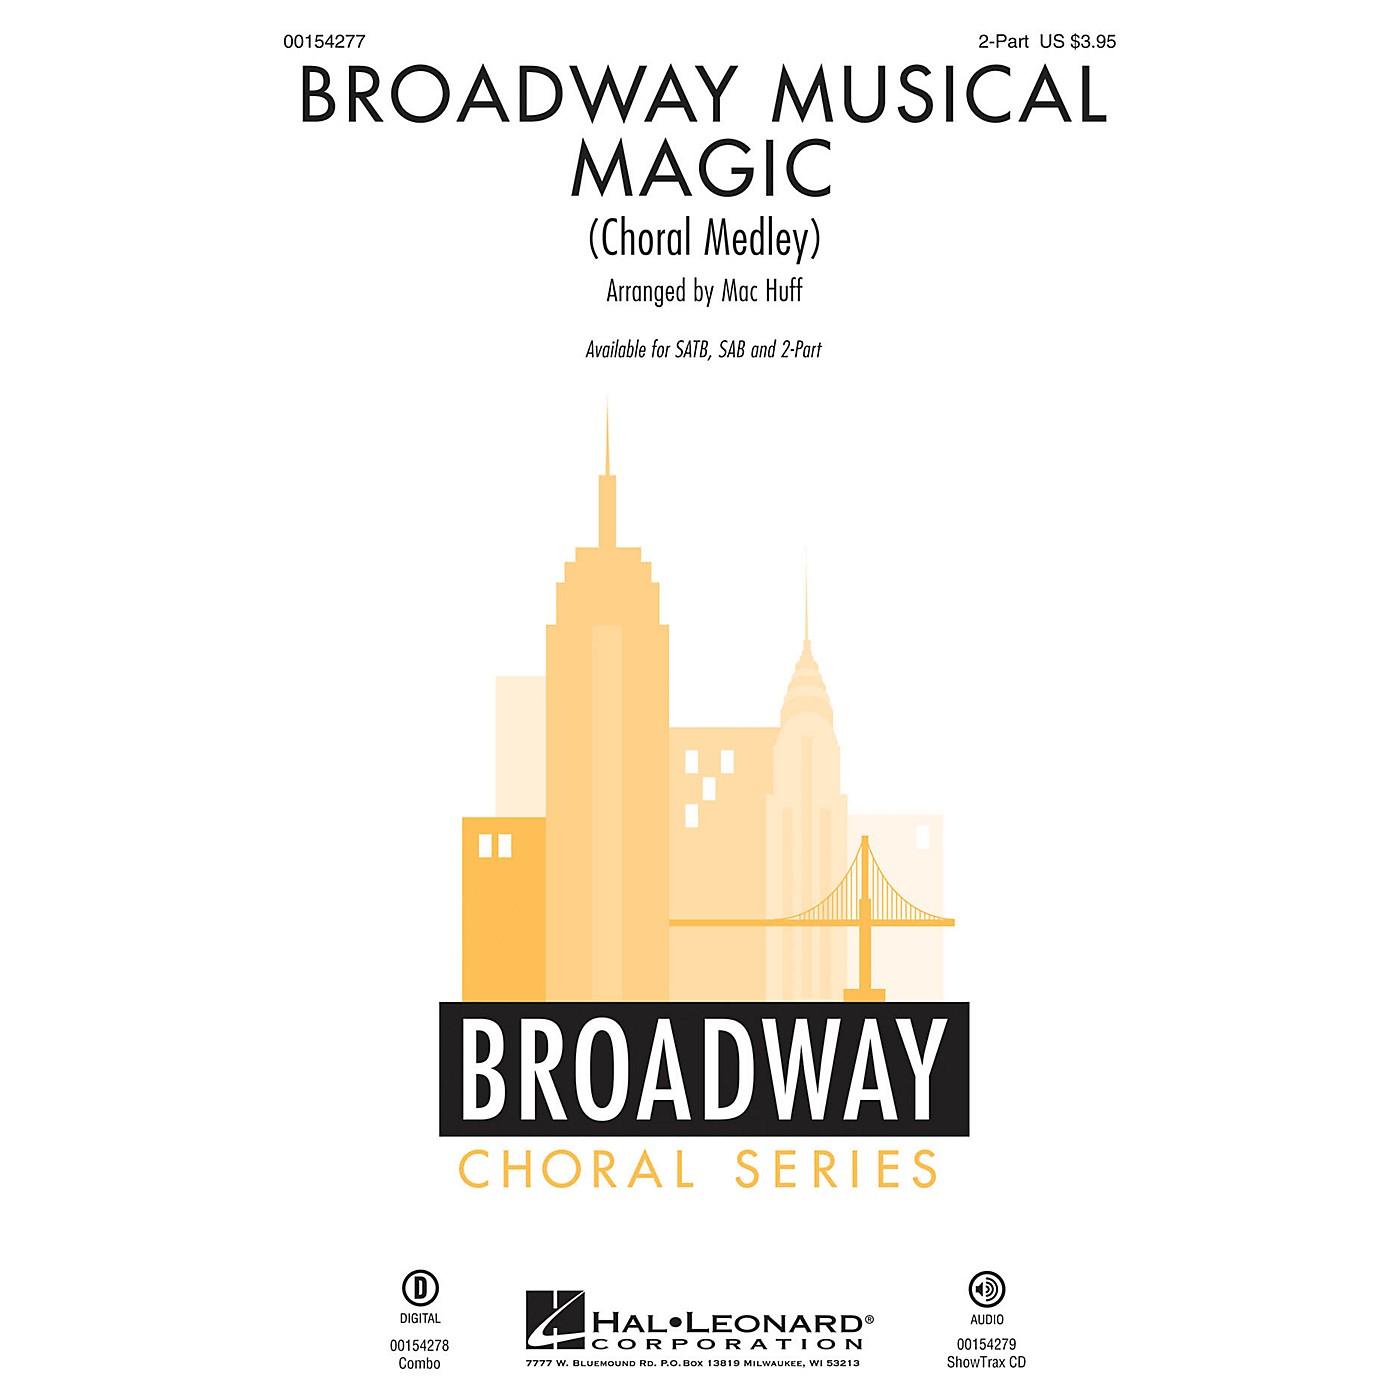 Hal Leonard Broadway Musical Magic (Choral Medley) 2-Part arranged by Mac Huff thumbnail